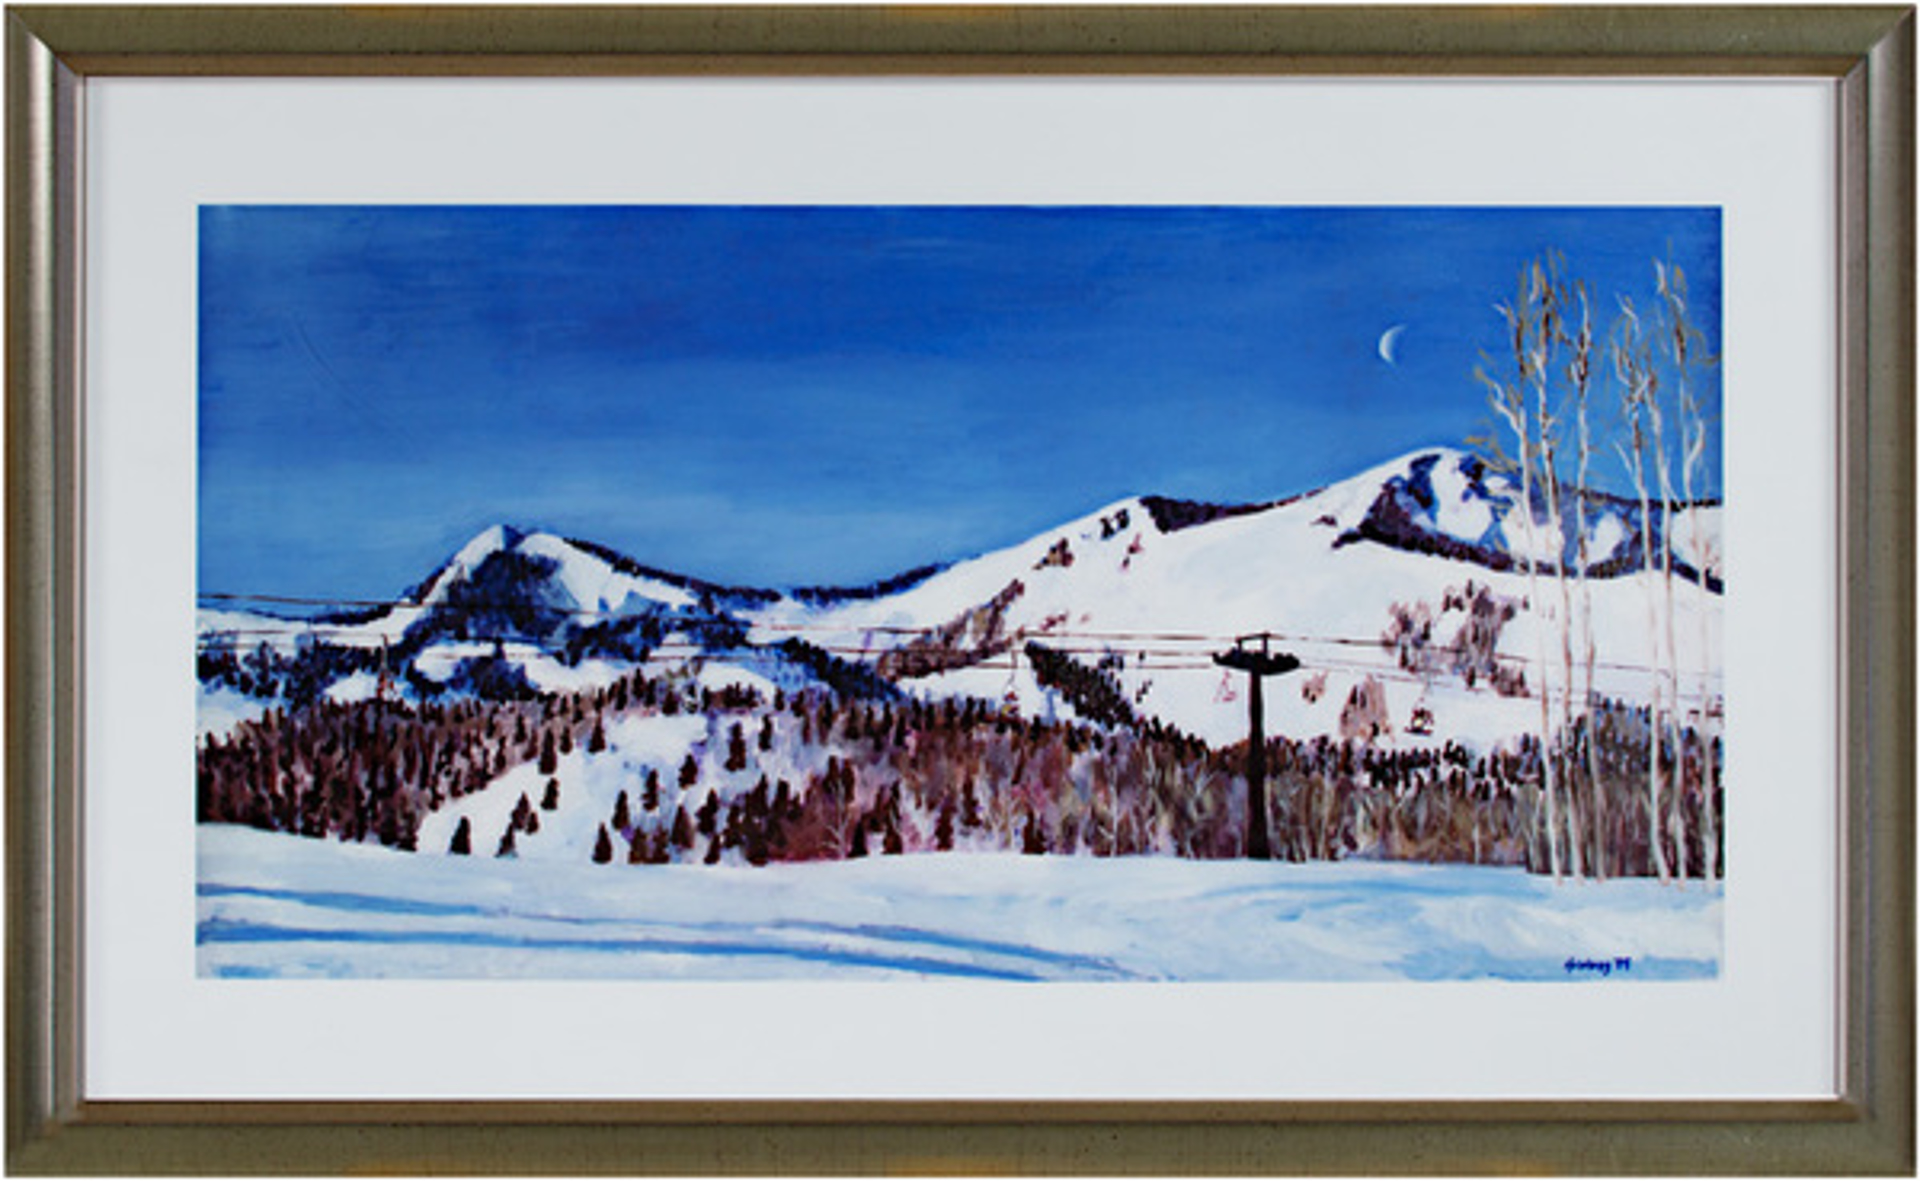 Skiing in the Western Rockies by Catherine Holmburg